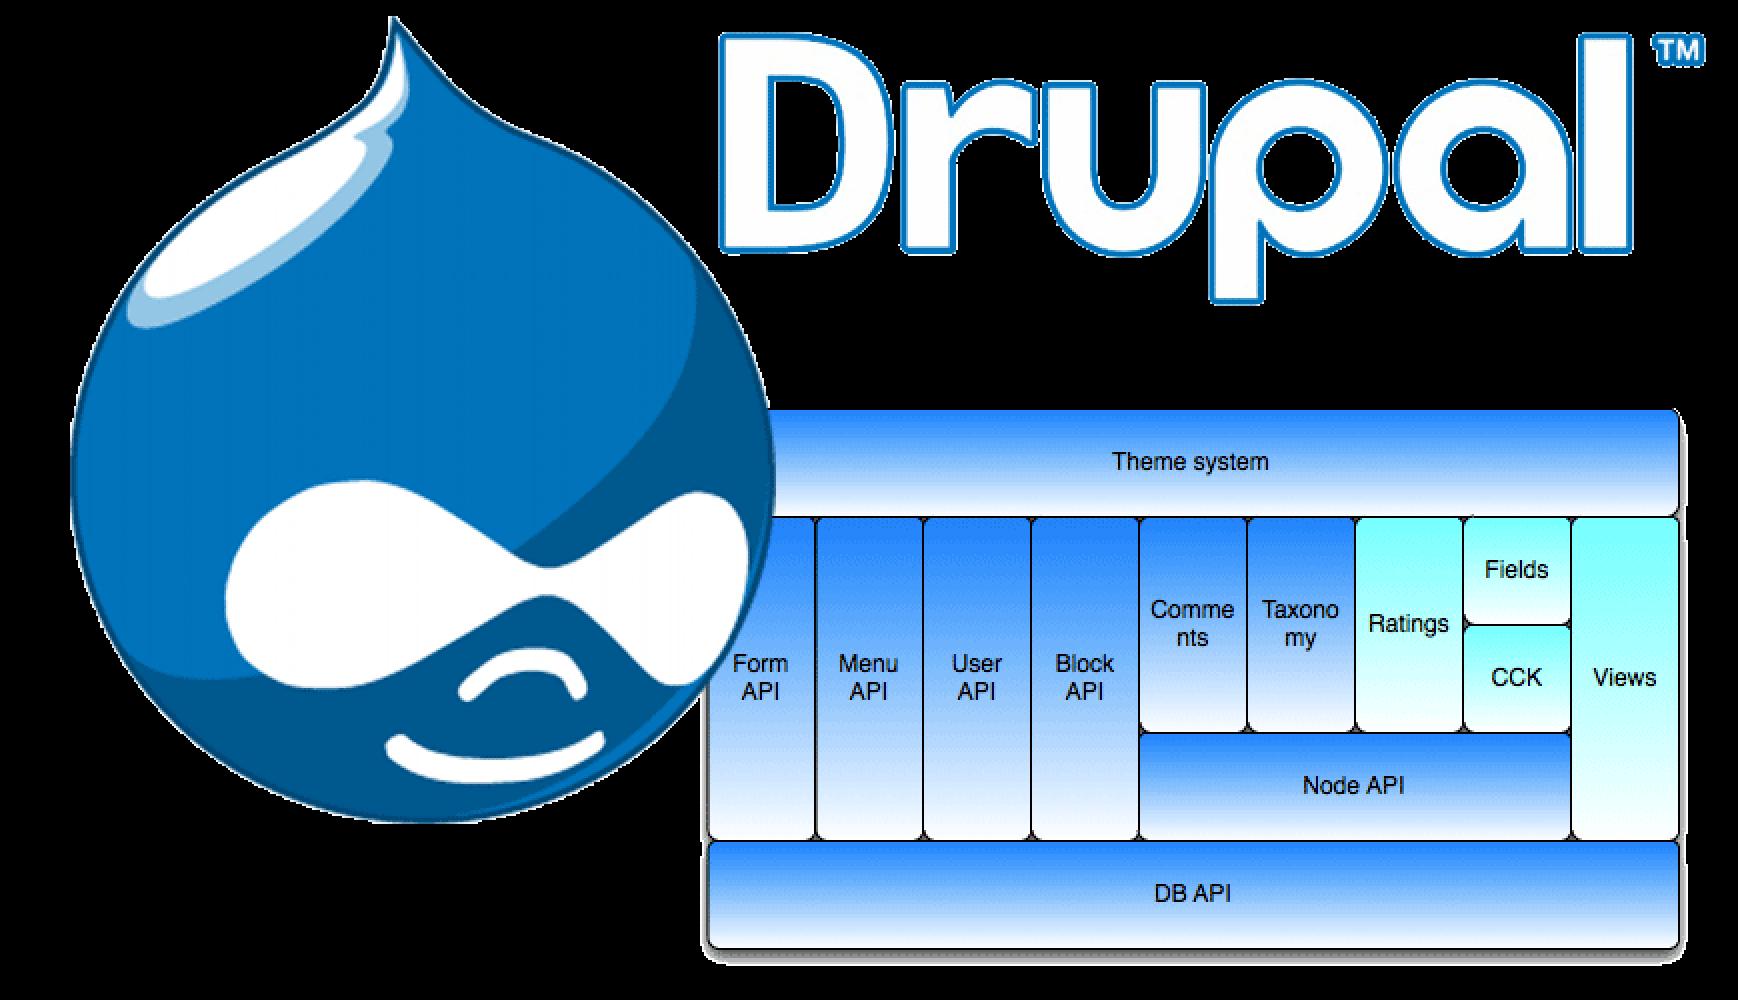 Free Open Source Drupal Themes